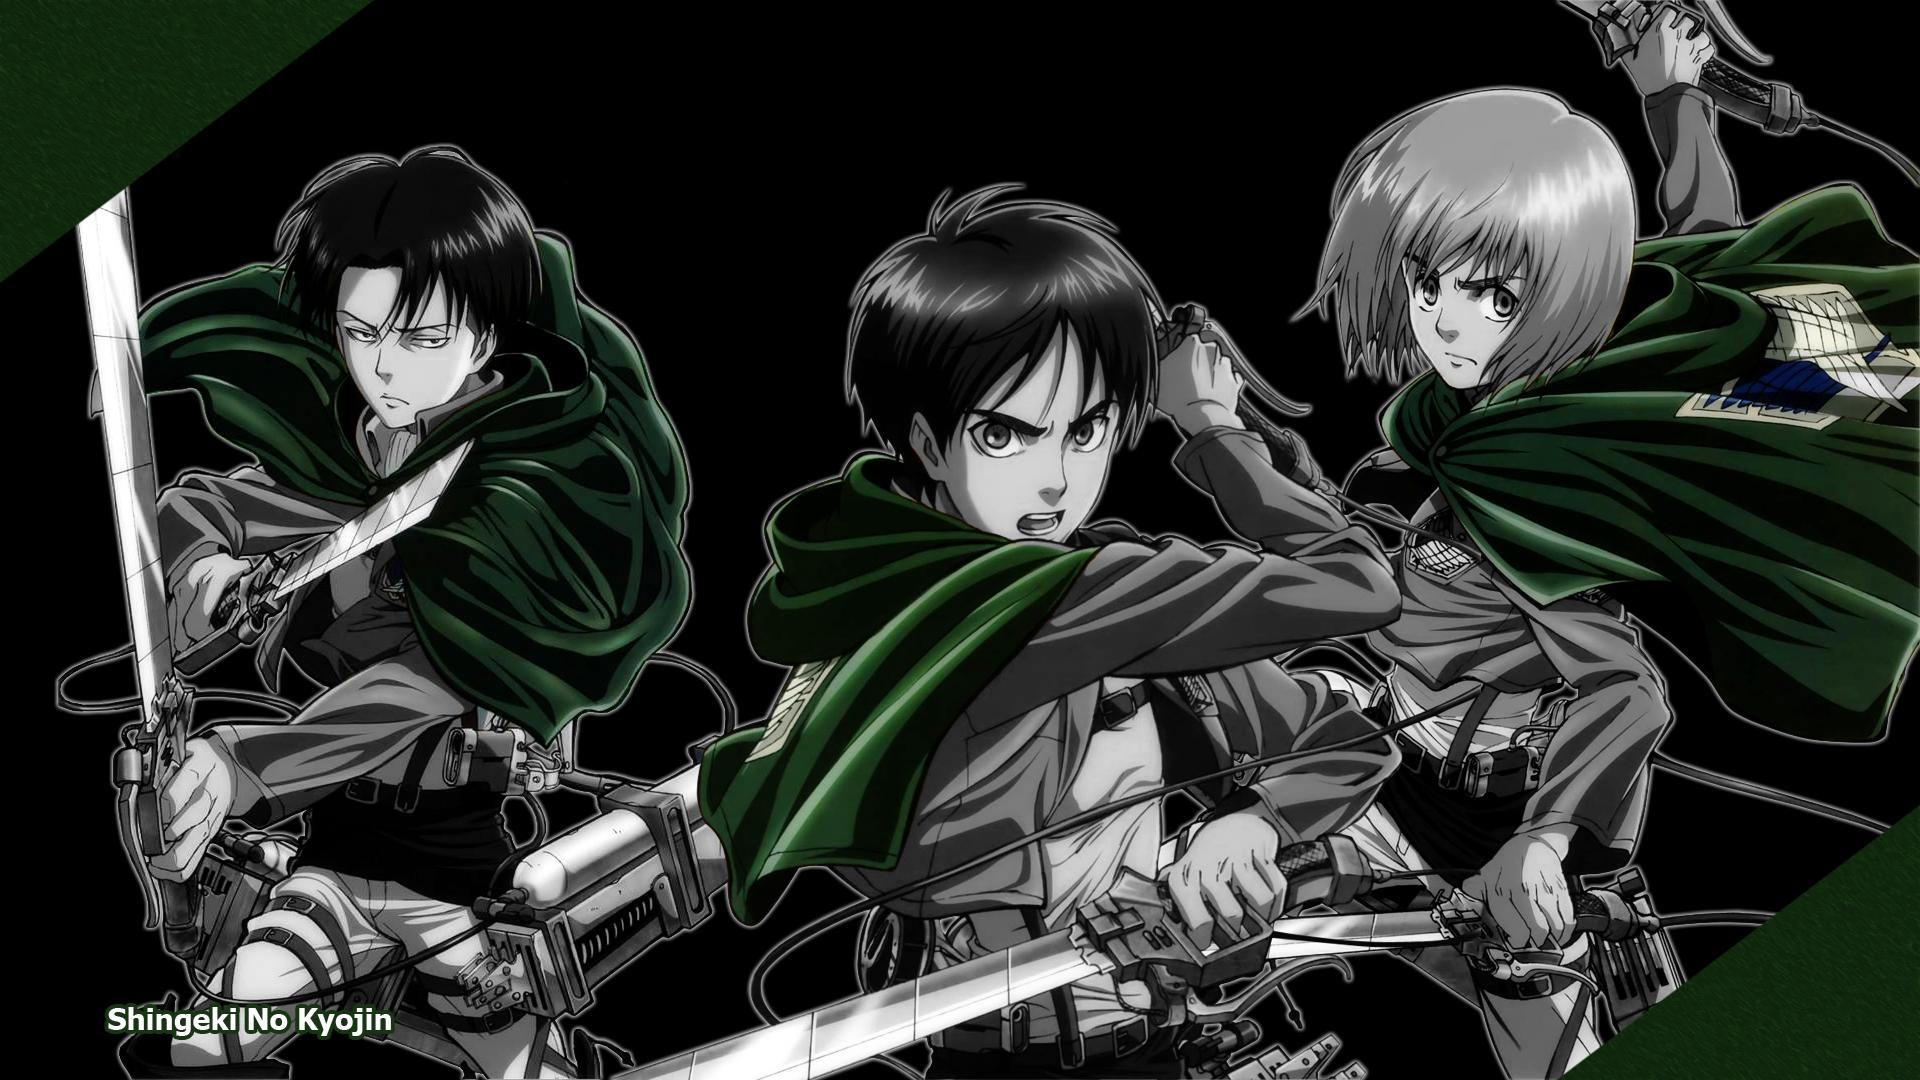 Shingeki no Kyojin (Attack on Titan) Wallpaper by Xeriz on DeviantArt